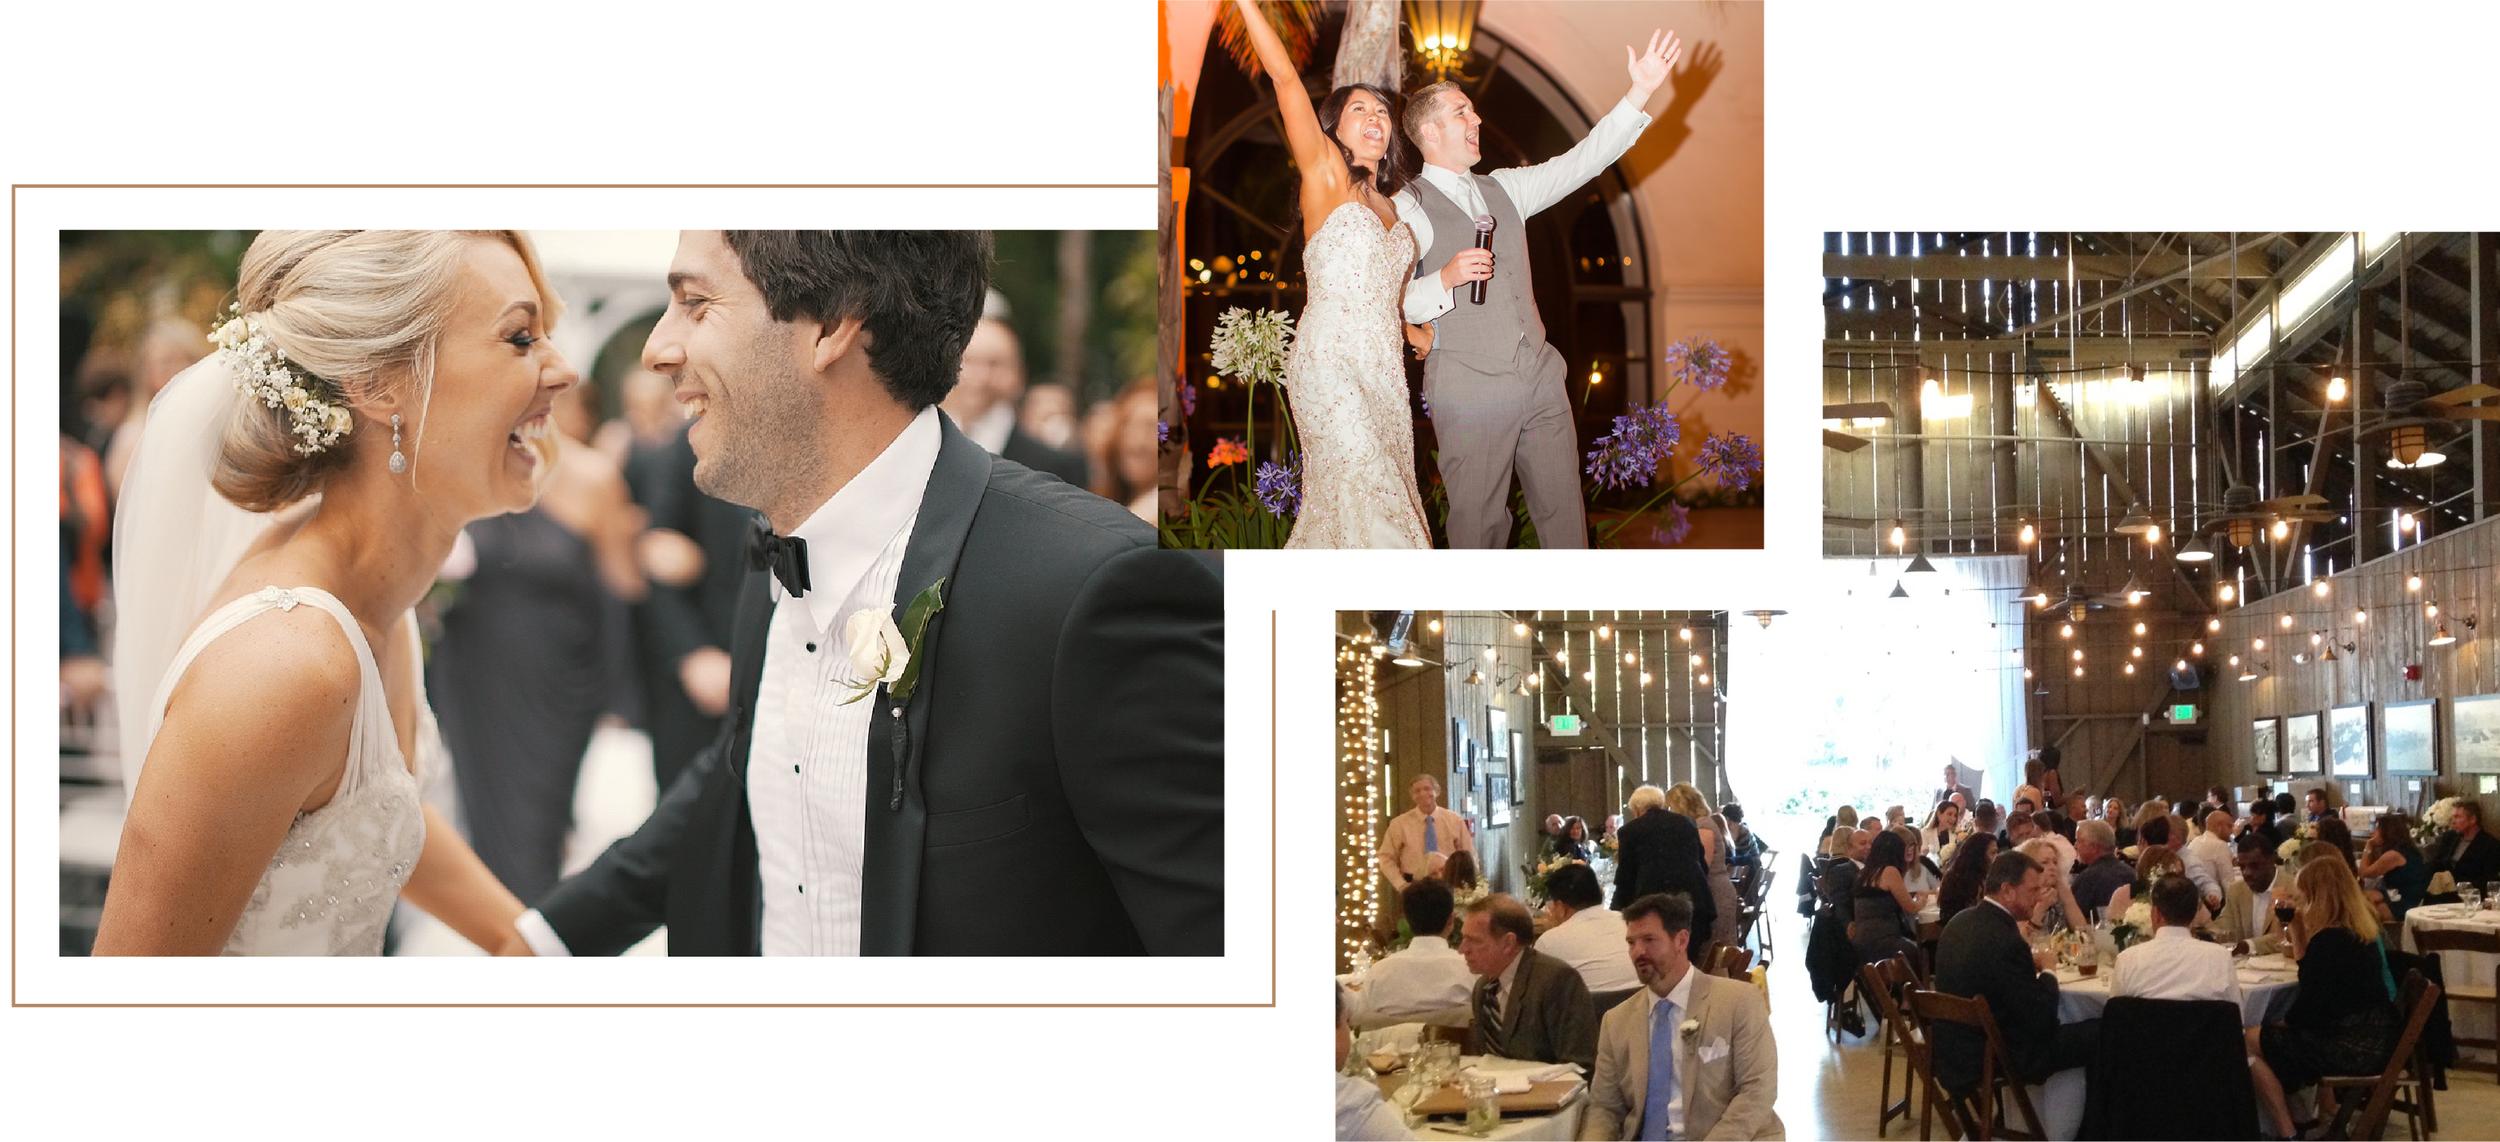 Santa Barbara Wedding DJs: DJ services and rentals